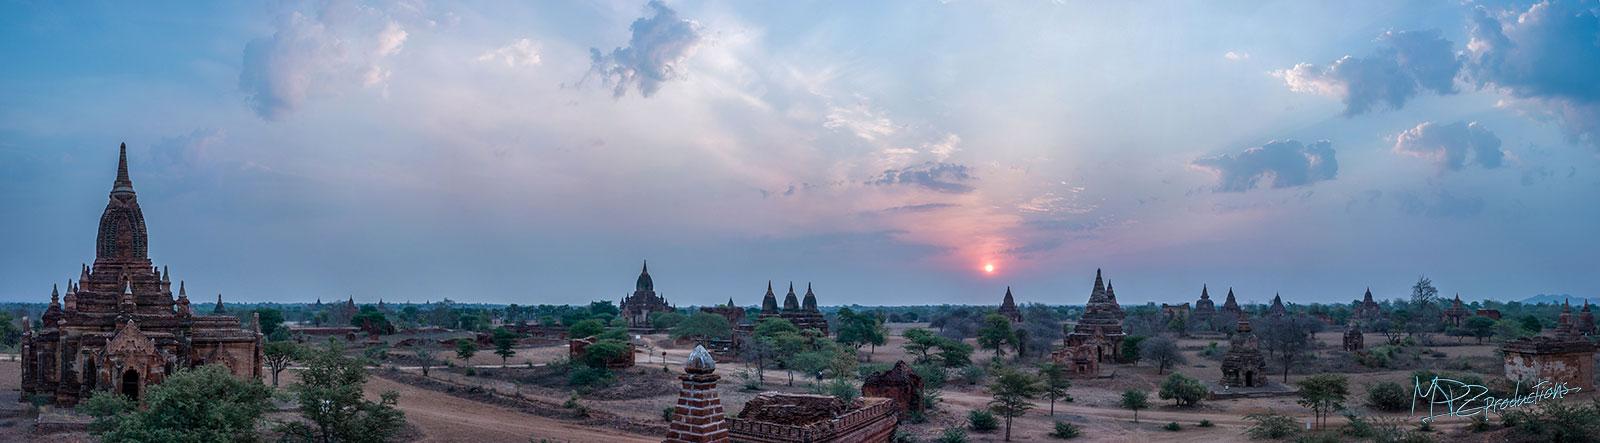 temple-pano.jpg